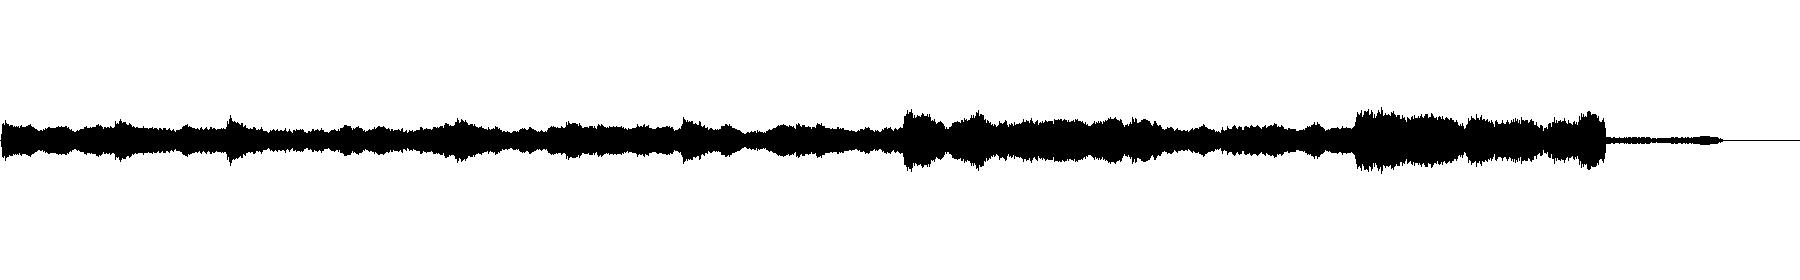 piano loop 1